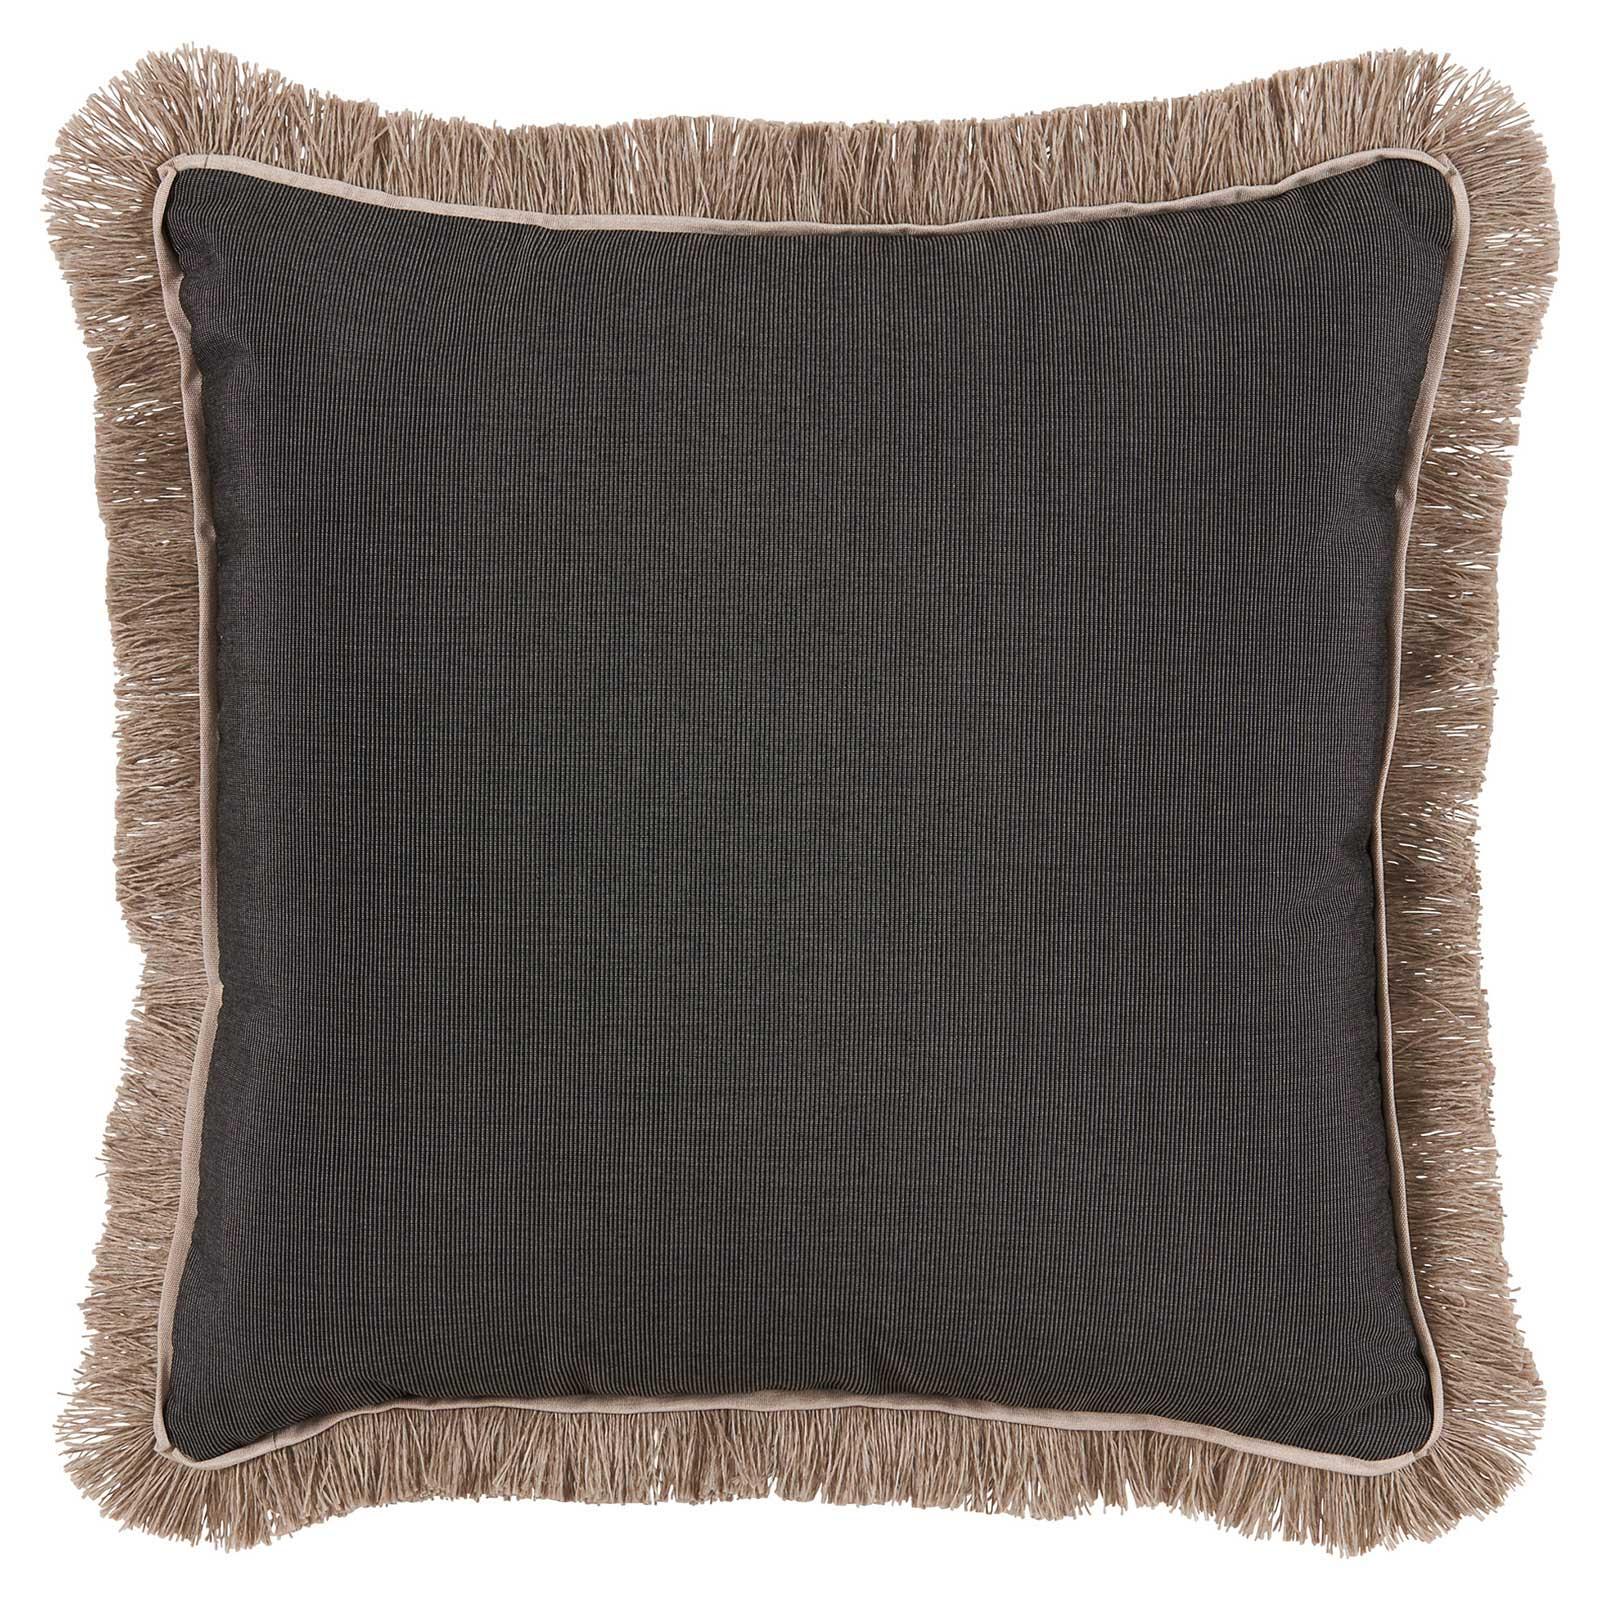 Talli Regency Fringe Black Outdoor Pillow - 20x20